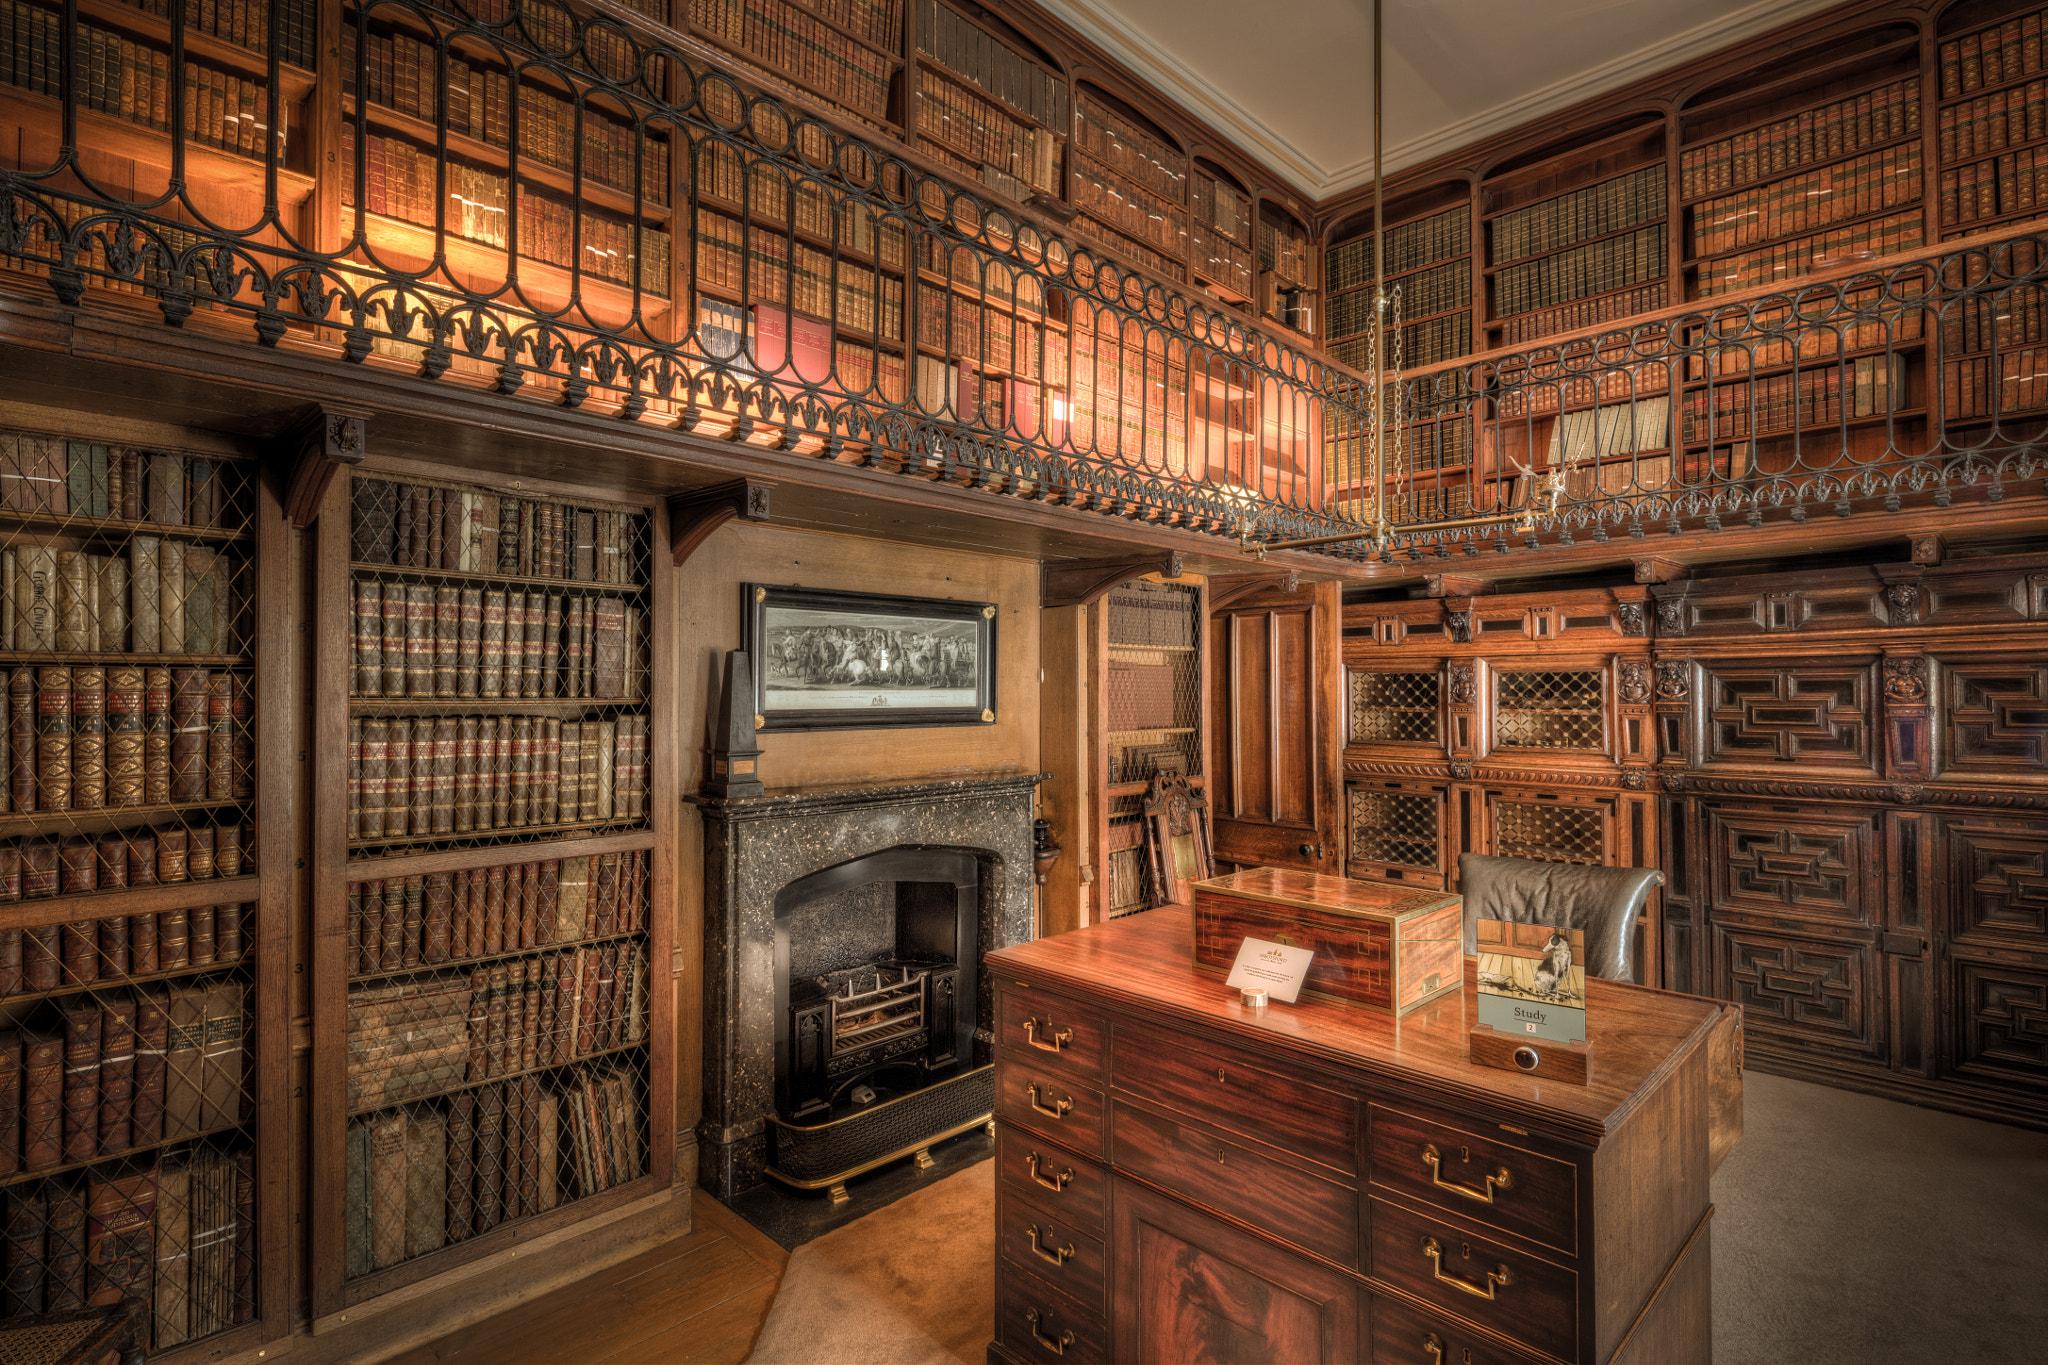 File Abbotsford House Study Room 248456373 Jpeg Wikimedia Commons